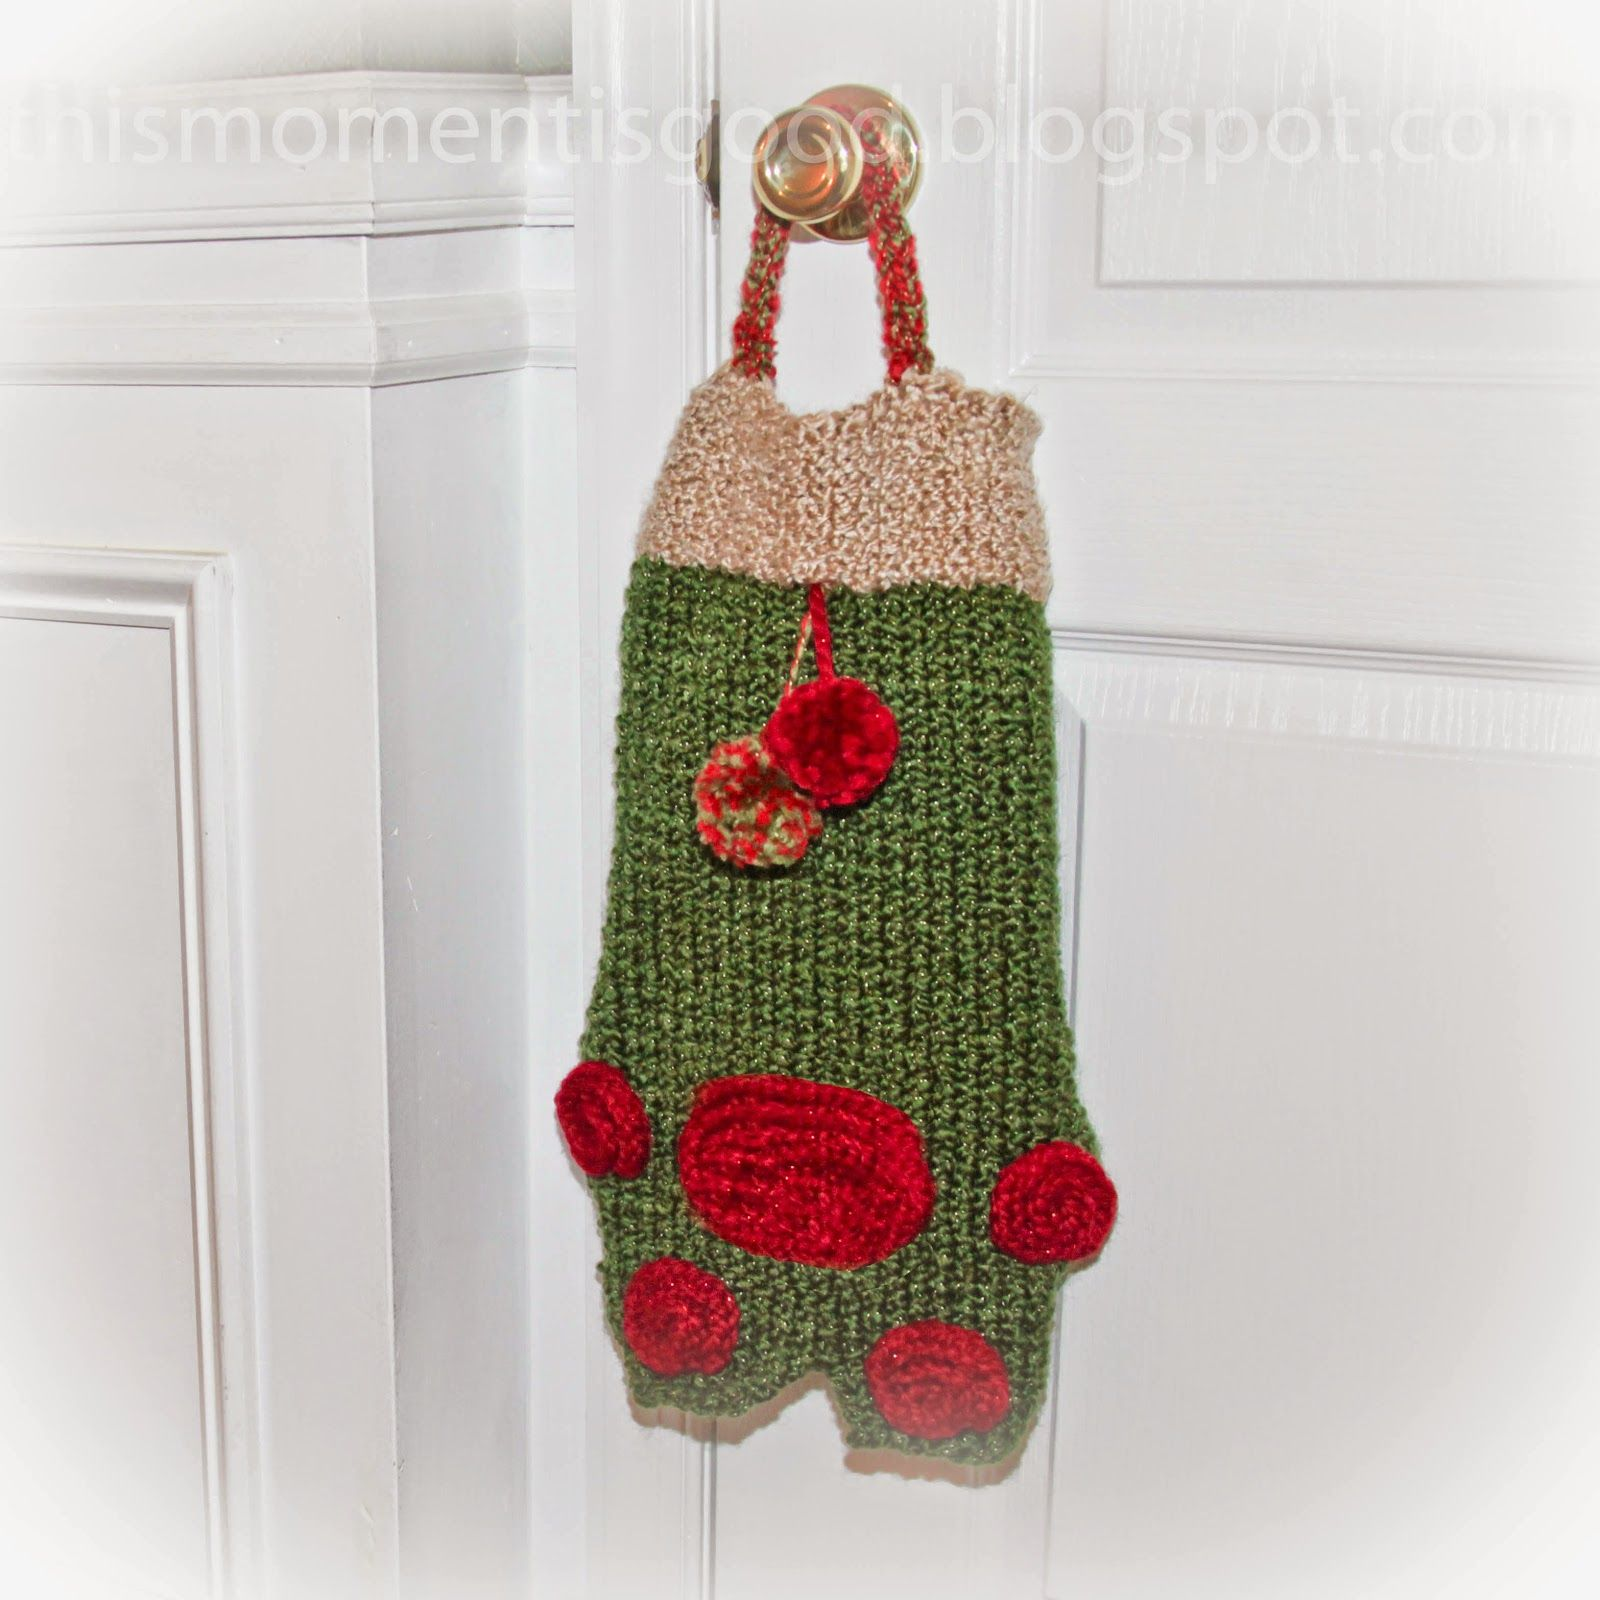 Loom Knit Christmas Ornaments Part - 28: LOOM KNIT PET STOCKING PATTERN... Knit Christmas OrnamentsChristmas ...